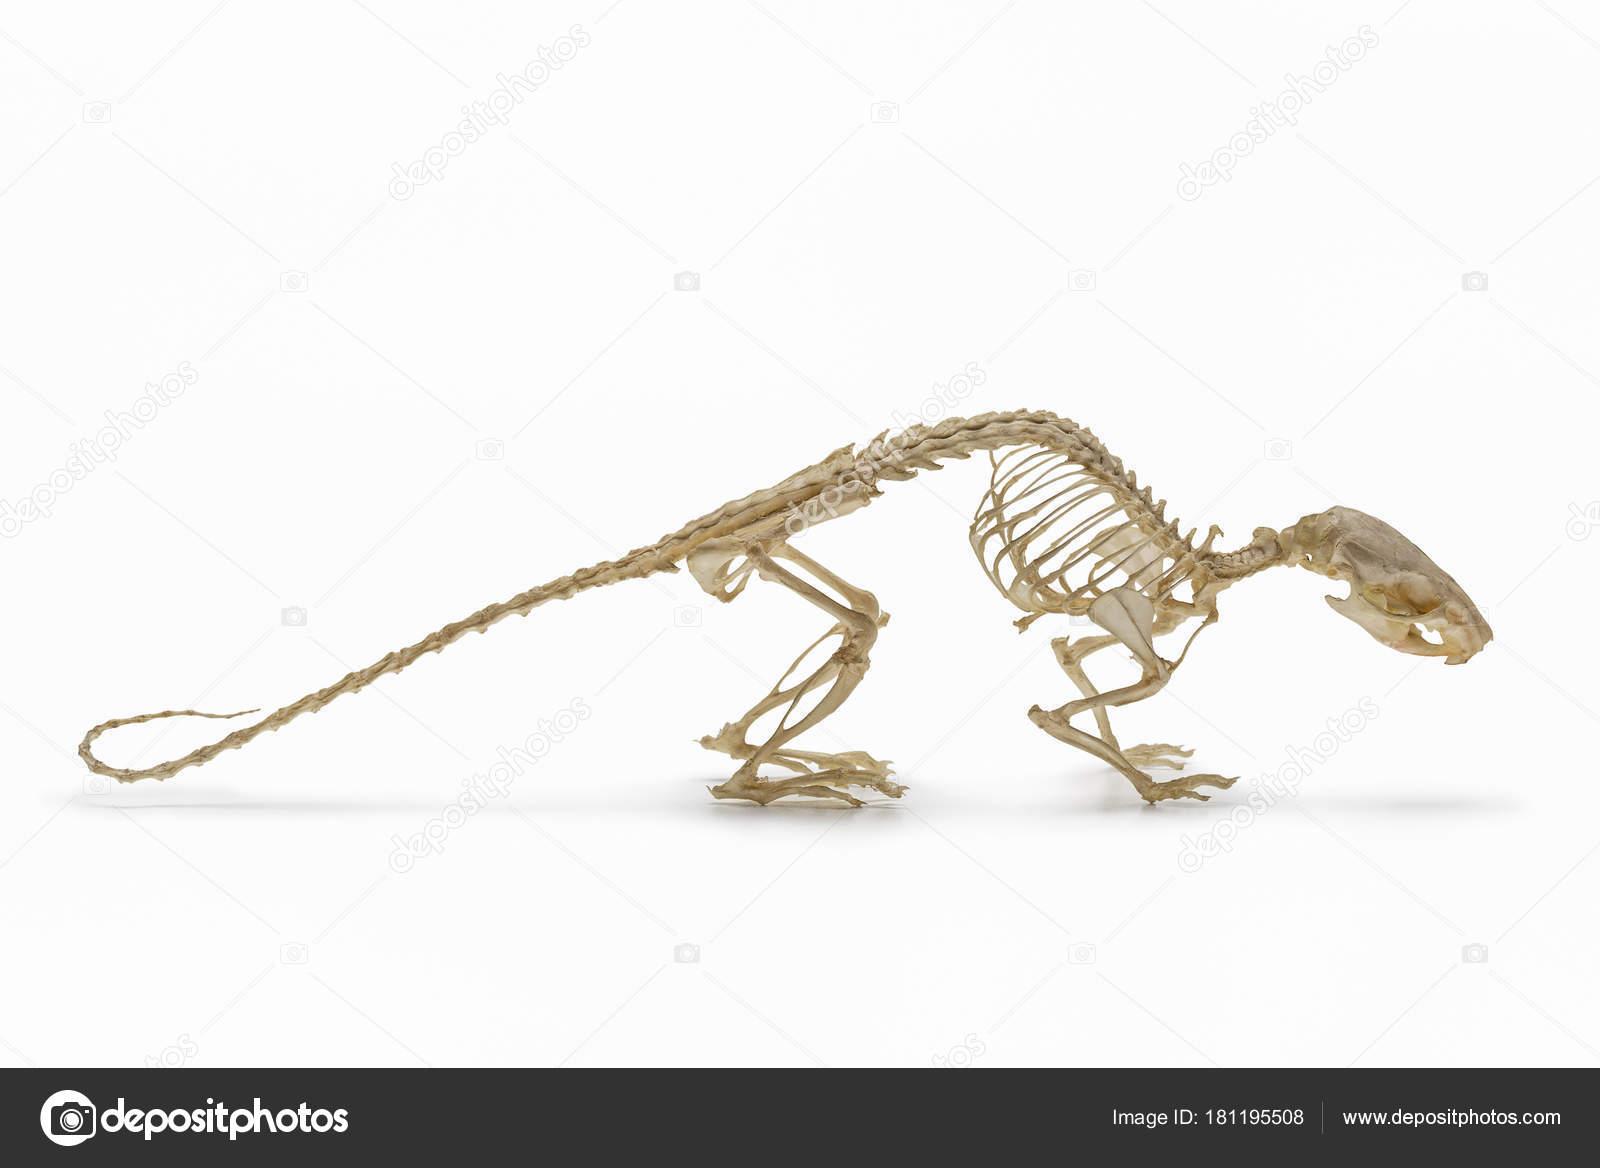 Natürliche Skelett Der Ratte — Stockfoto © kot36 #181195508